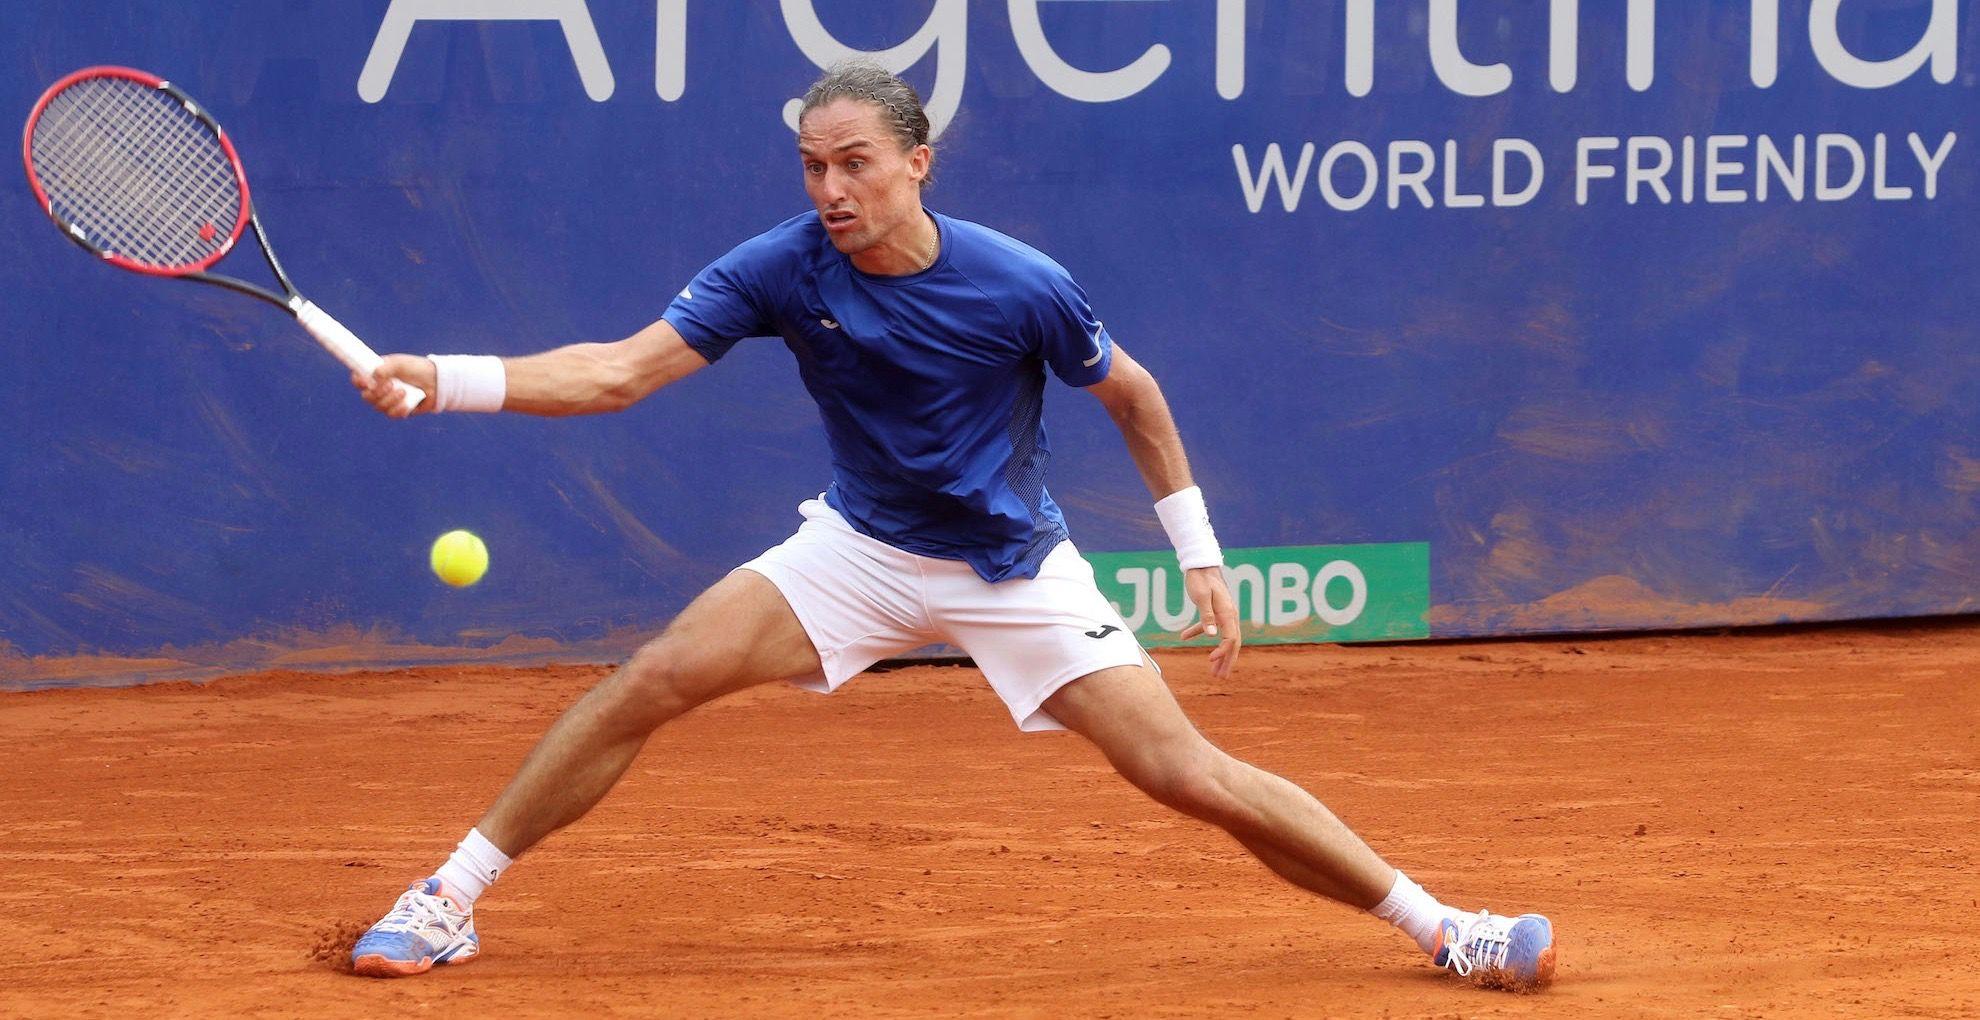 Прогноз на матч: Александр Долгополов — Орасио Себальос